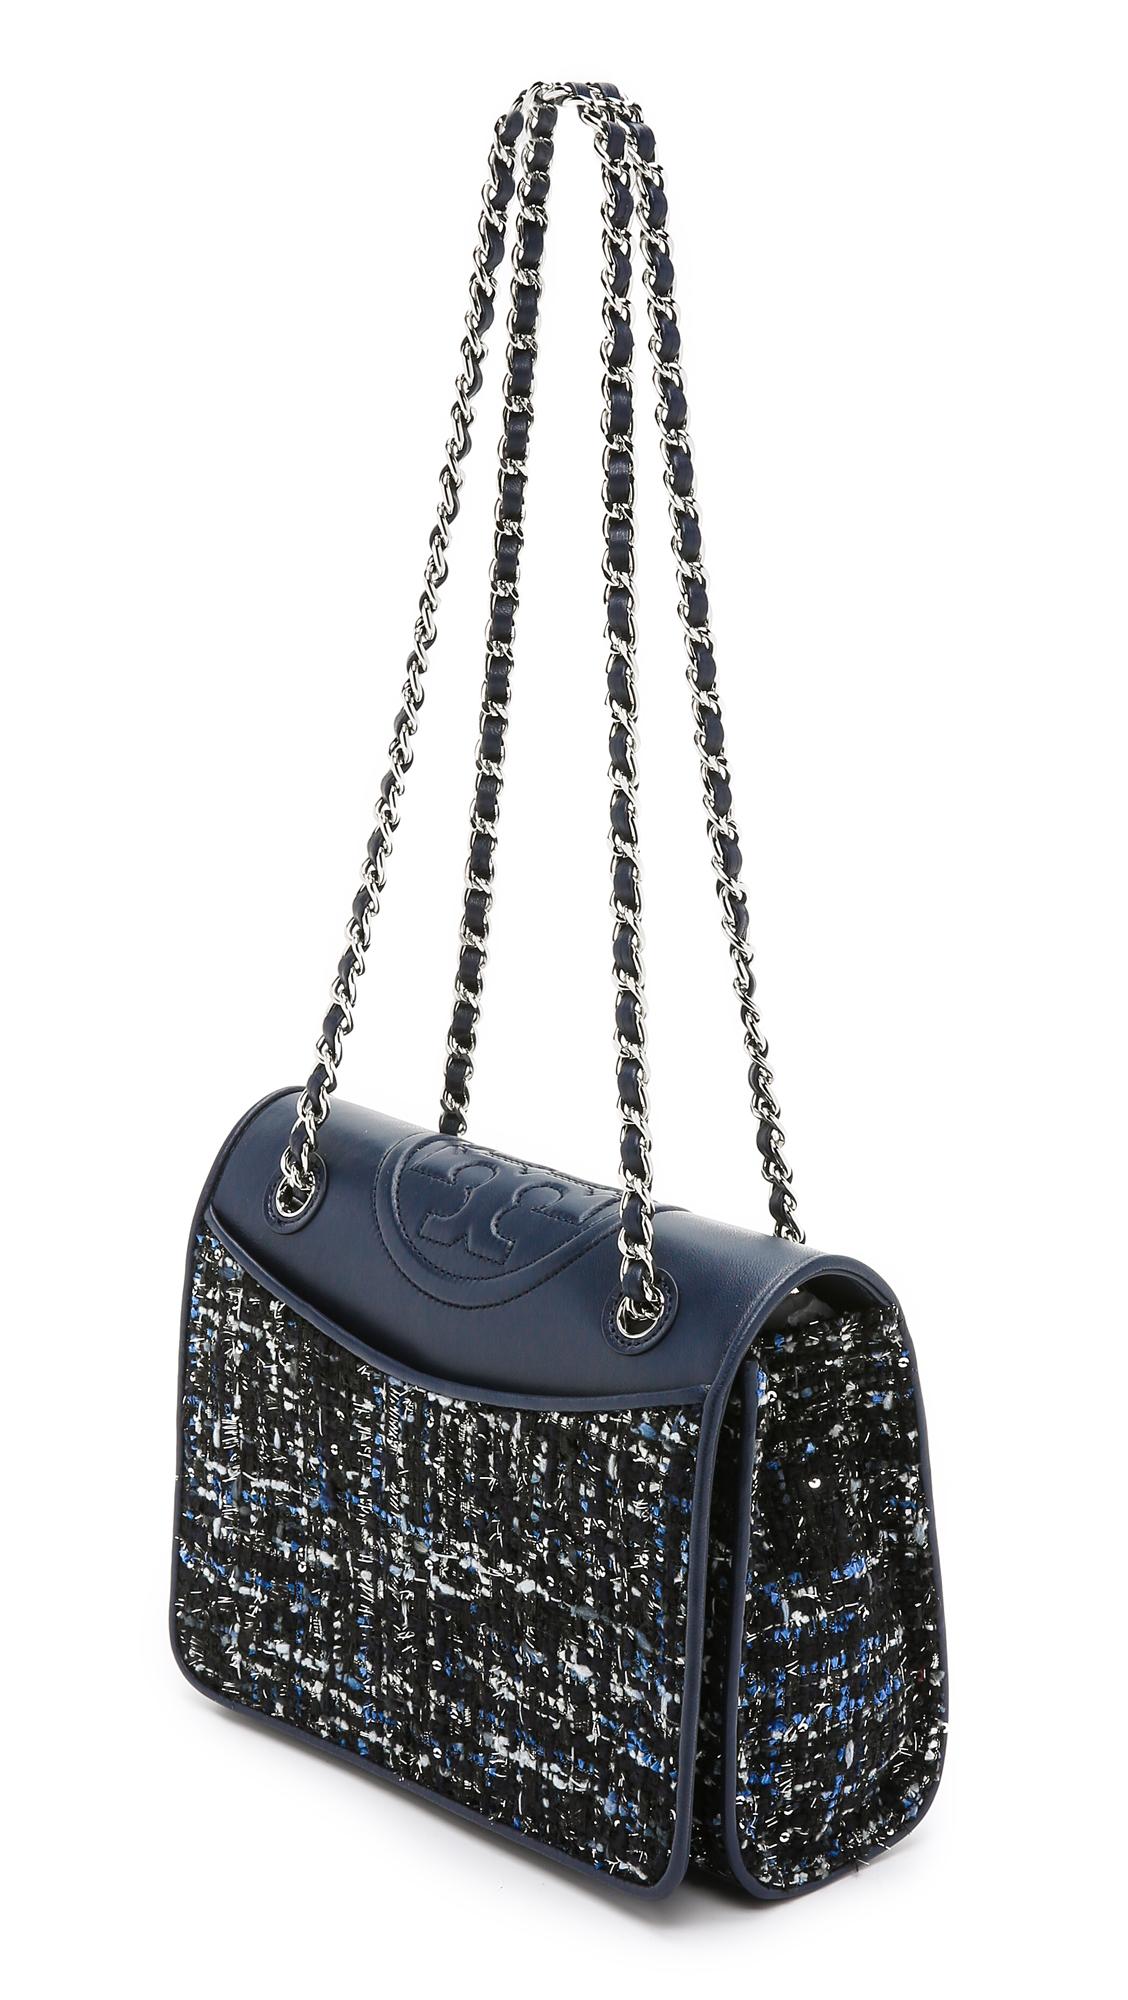 61c8e80a6aee Tory Burch Marion Tweed Medium Fleming Bag